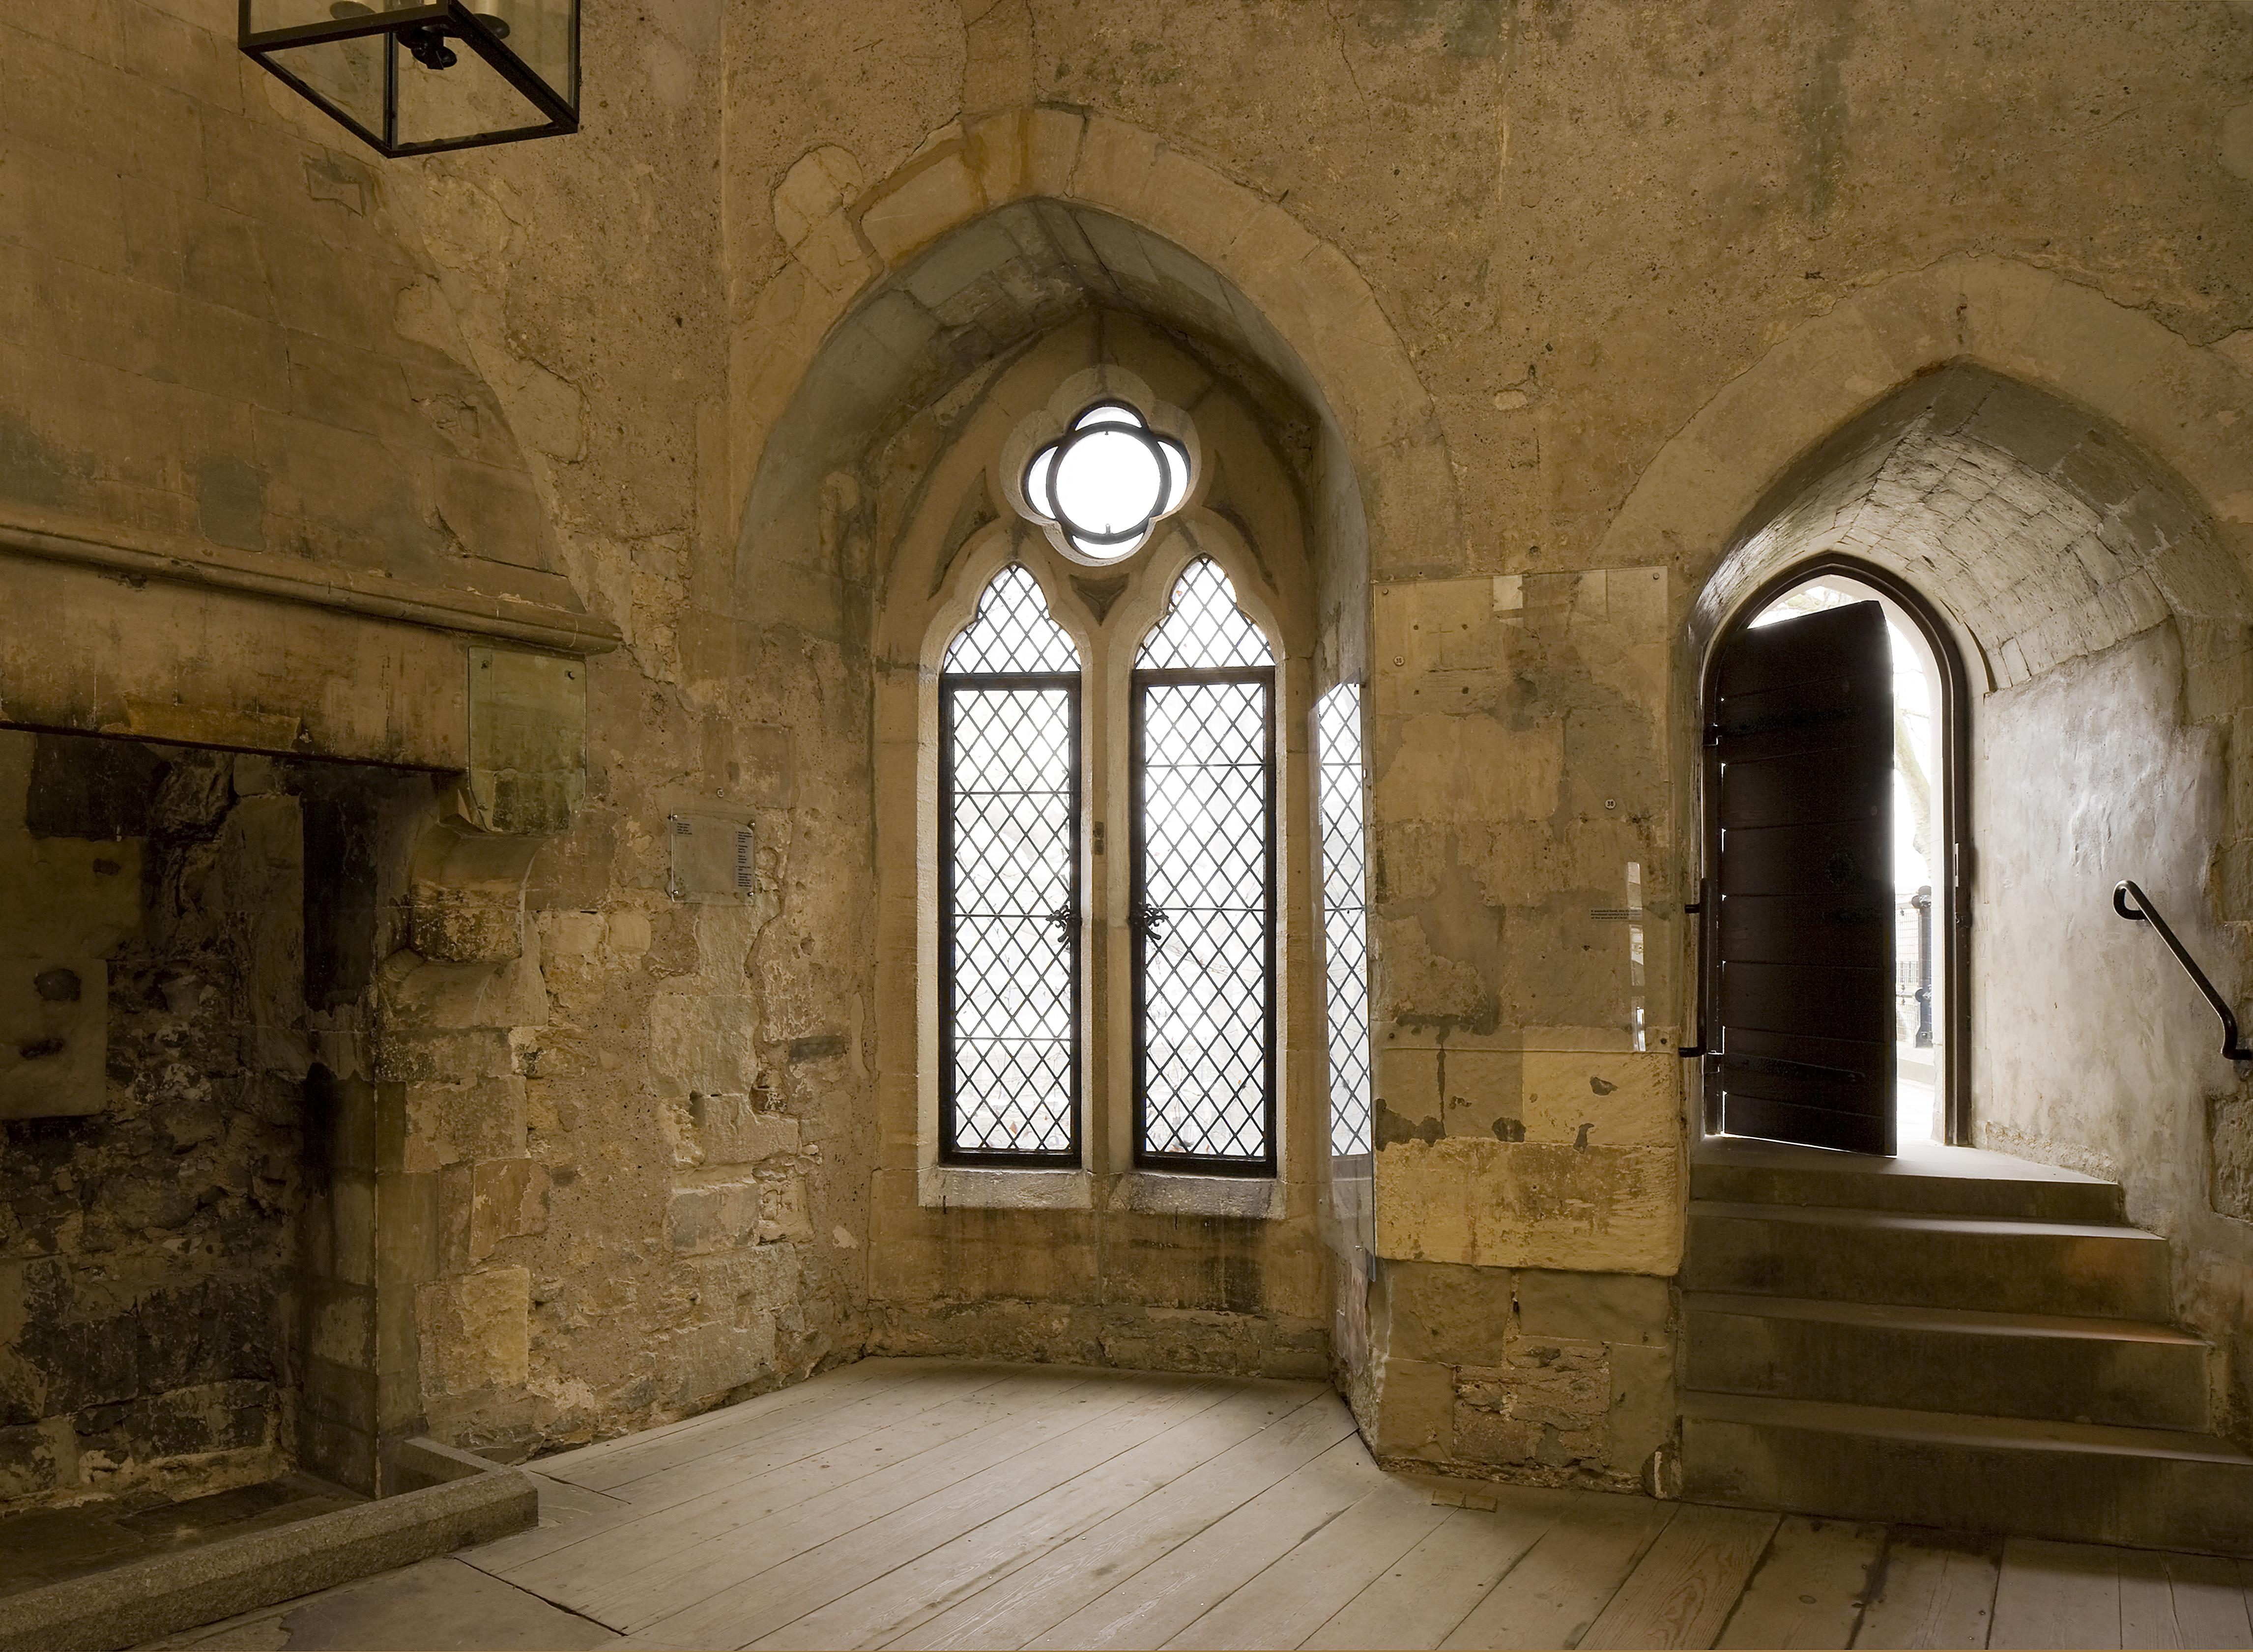 A photograph inside the Salt tower of on its windows ans doors